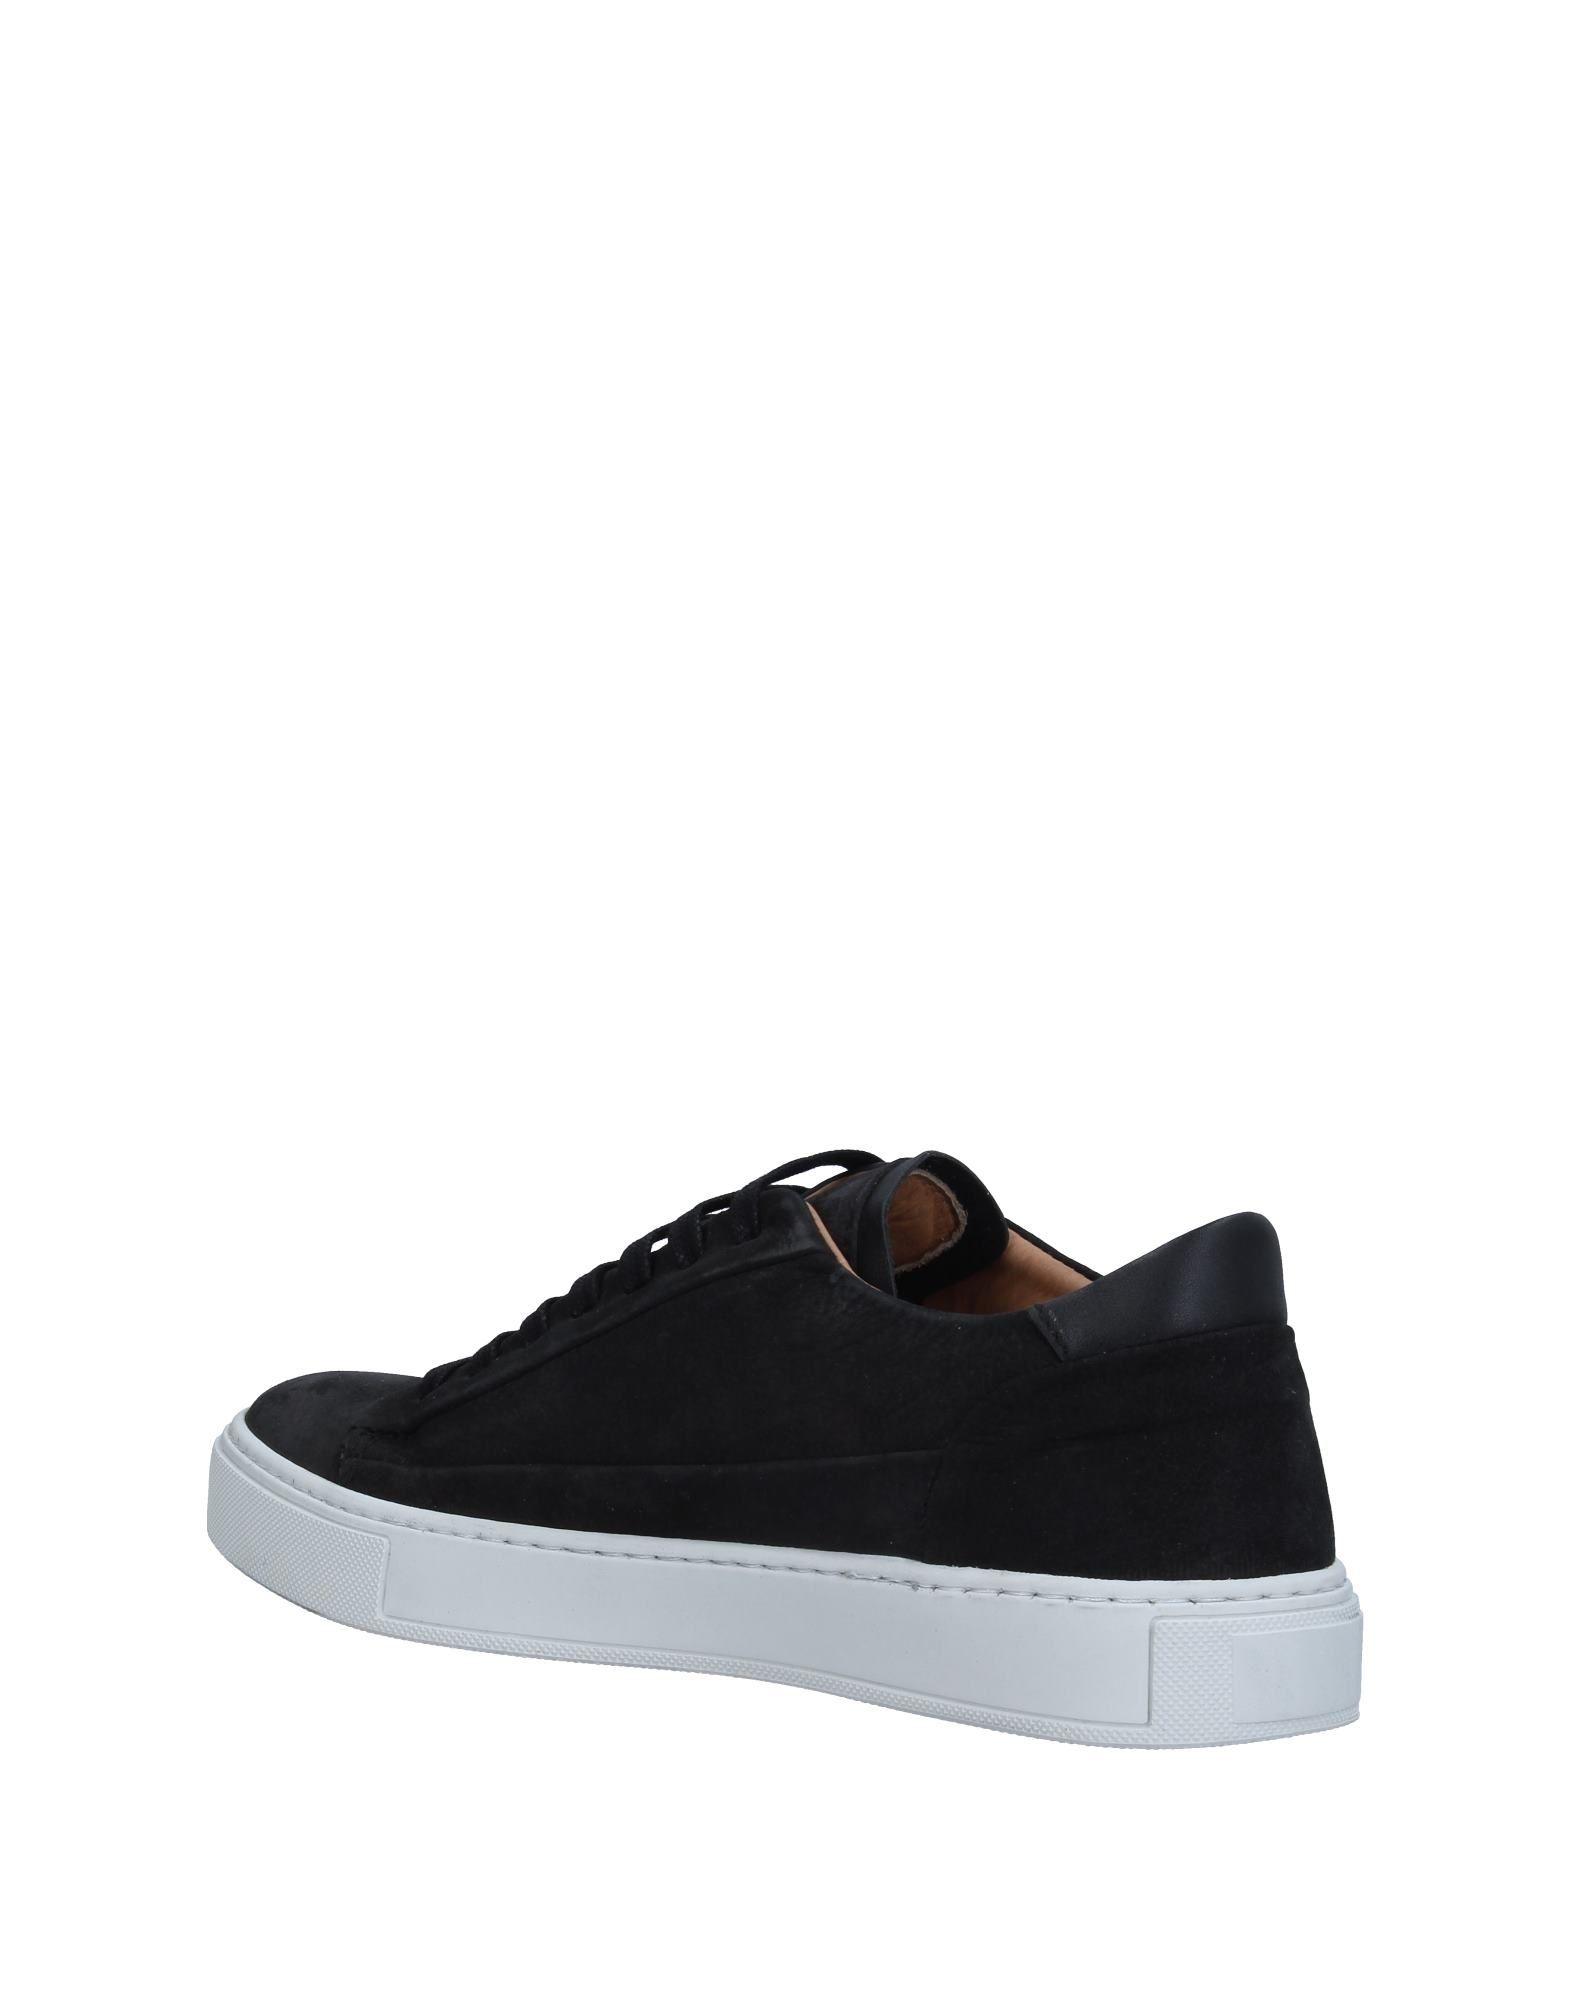 Sneakers Low Brand Homme - Sneakers Low Brand sur